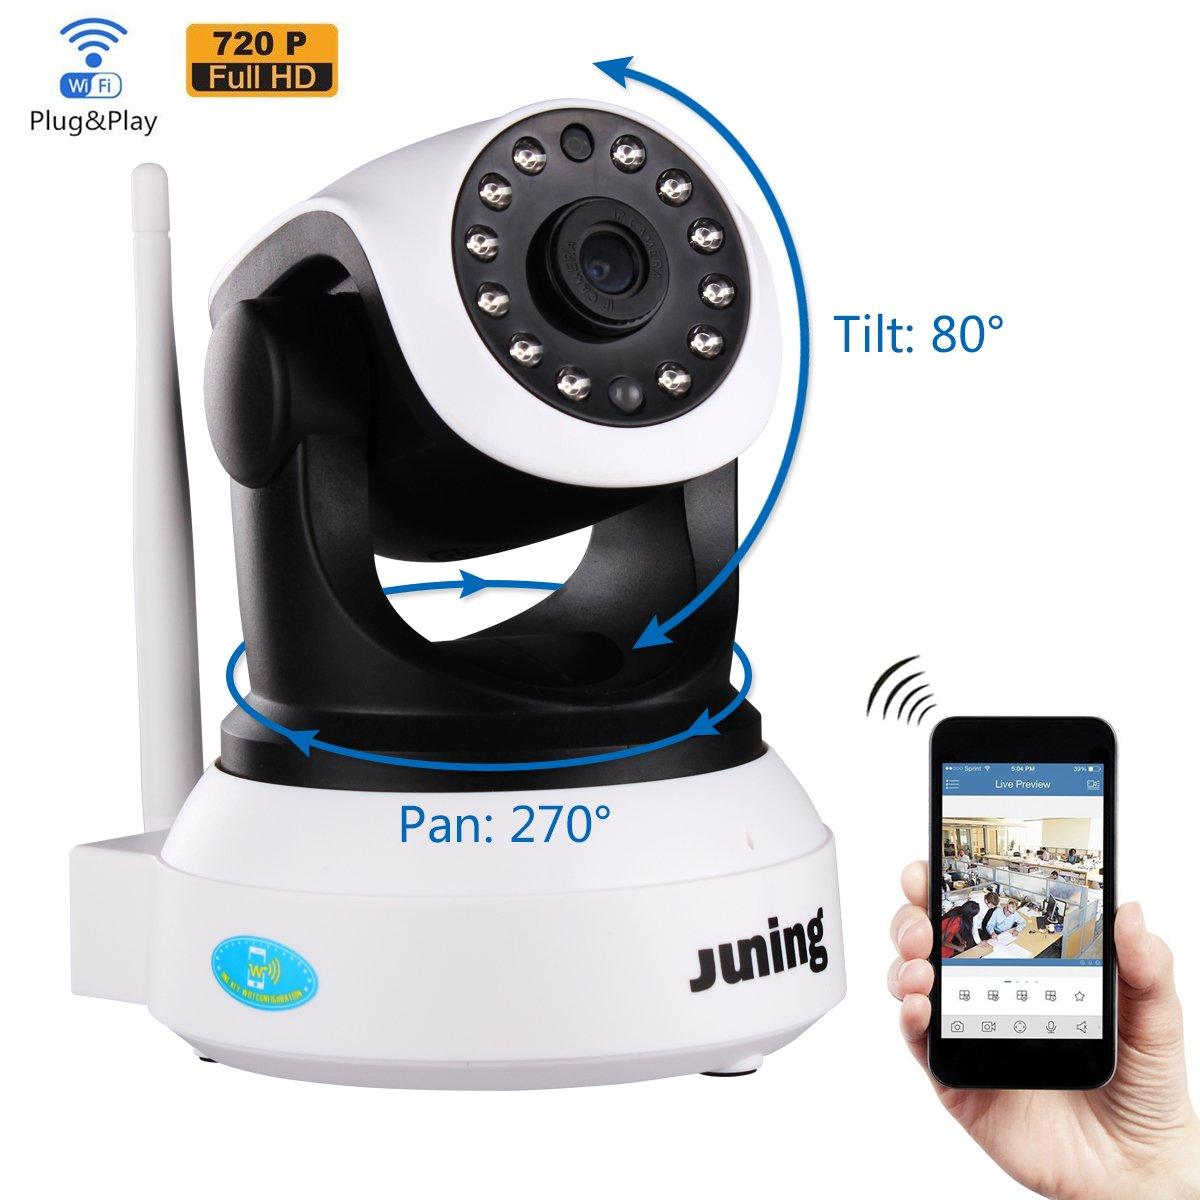 Amazon.com : Wifi Wireless Security Cameras 720P HD Pan Tilt-JUNING ...